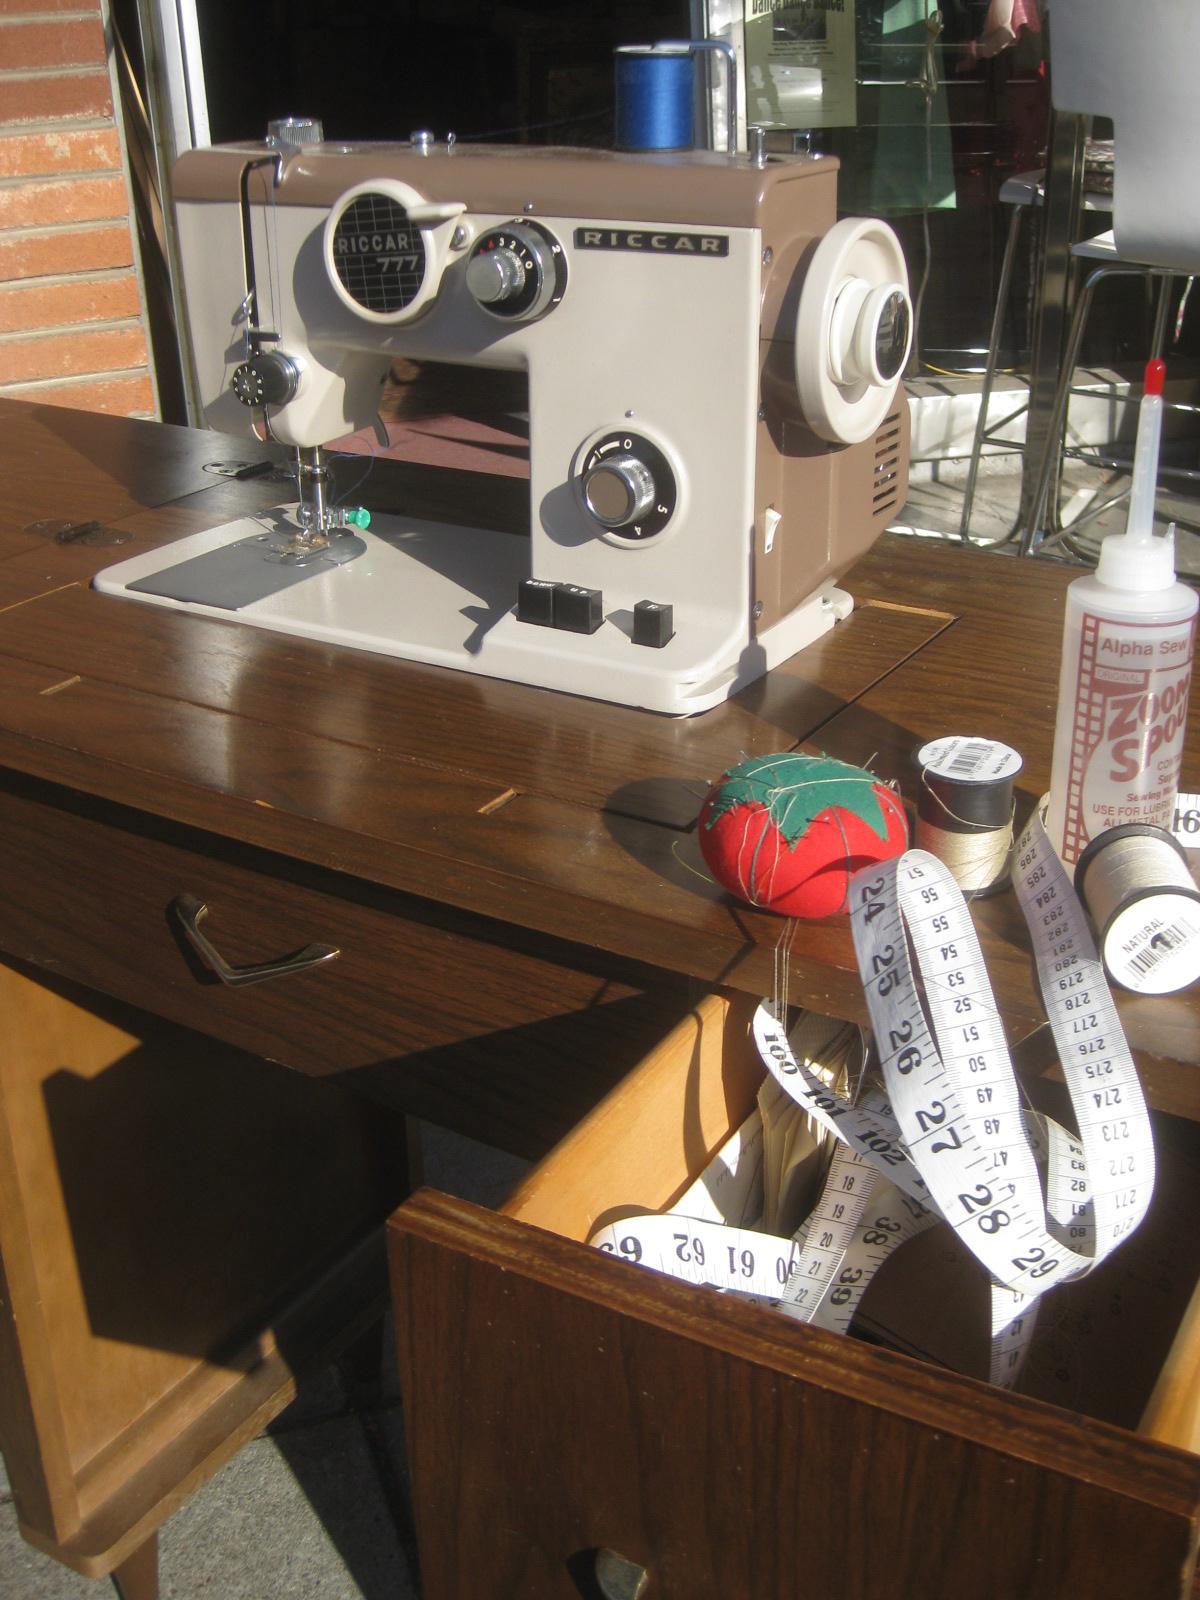 riccar 777 sewing machine